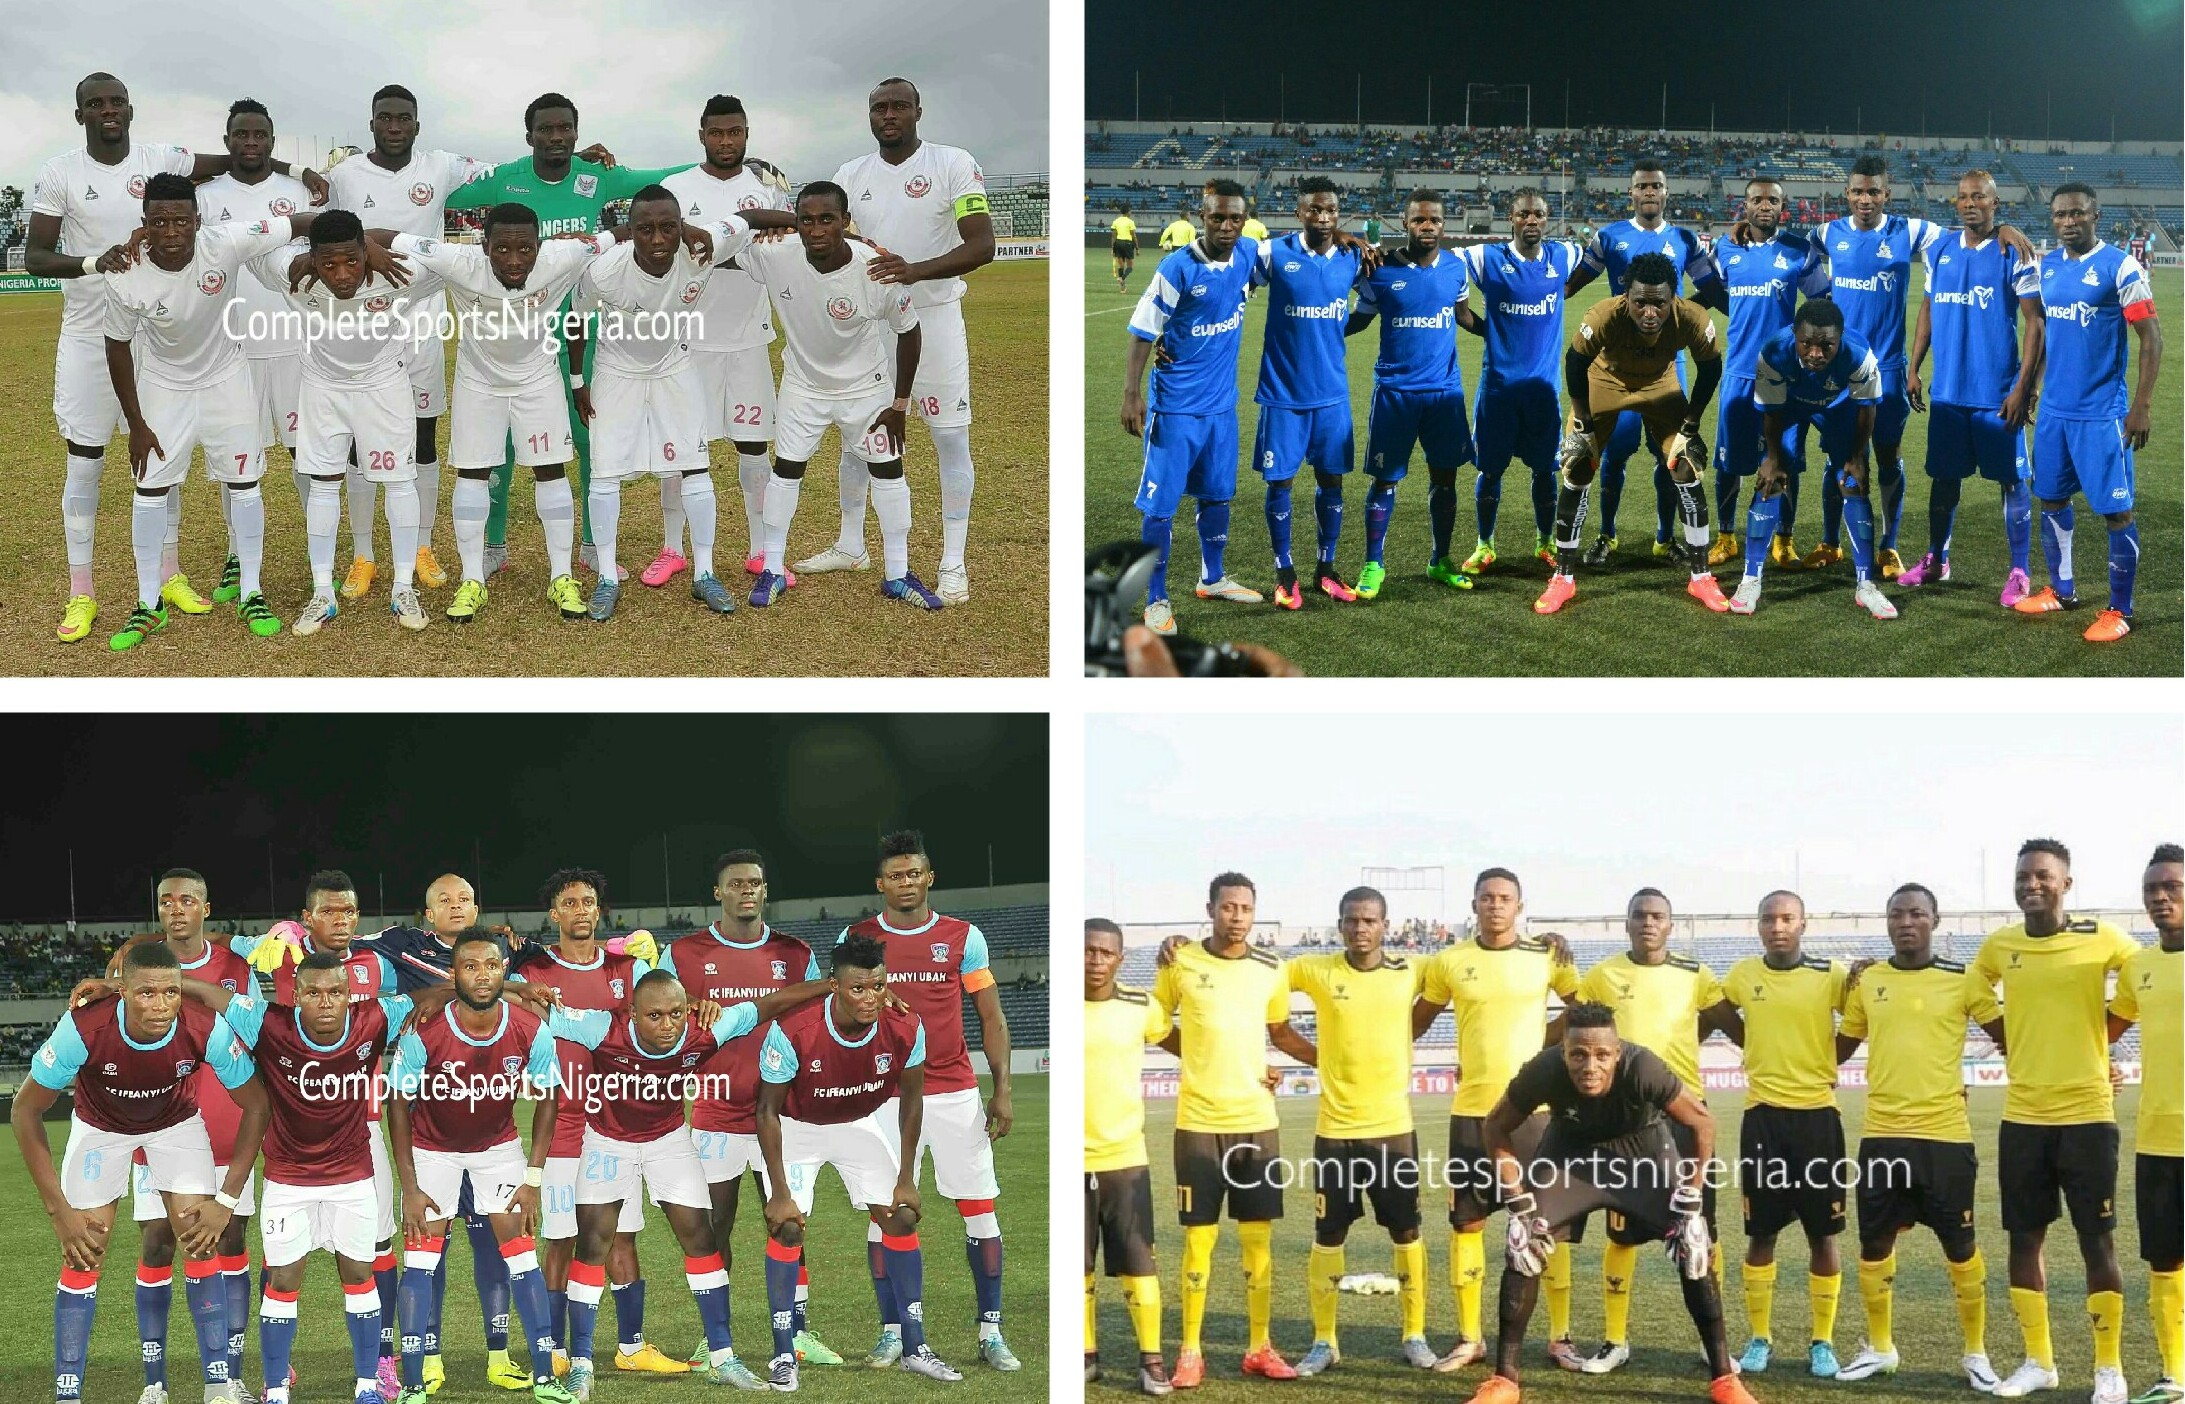 LMC Reschedules Rangers, Rivers United, FC IfeanyiUbah, Wikki Tourists Matches